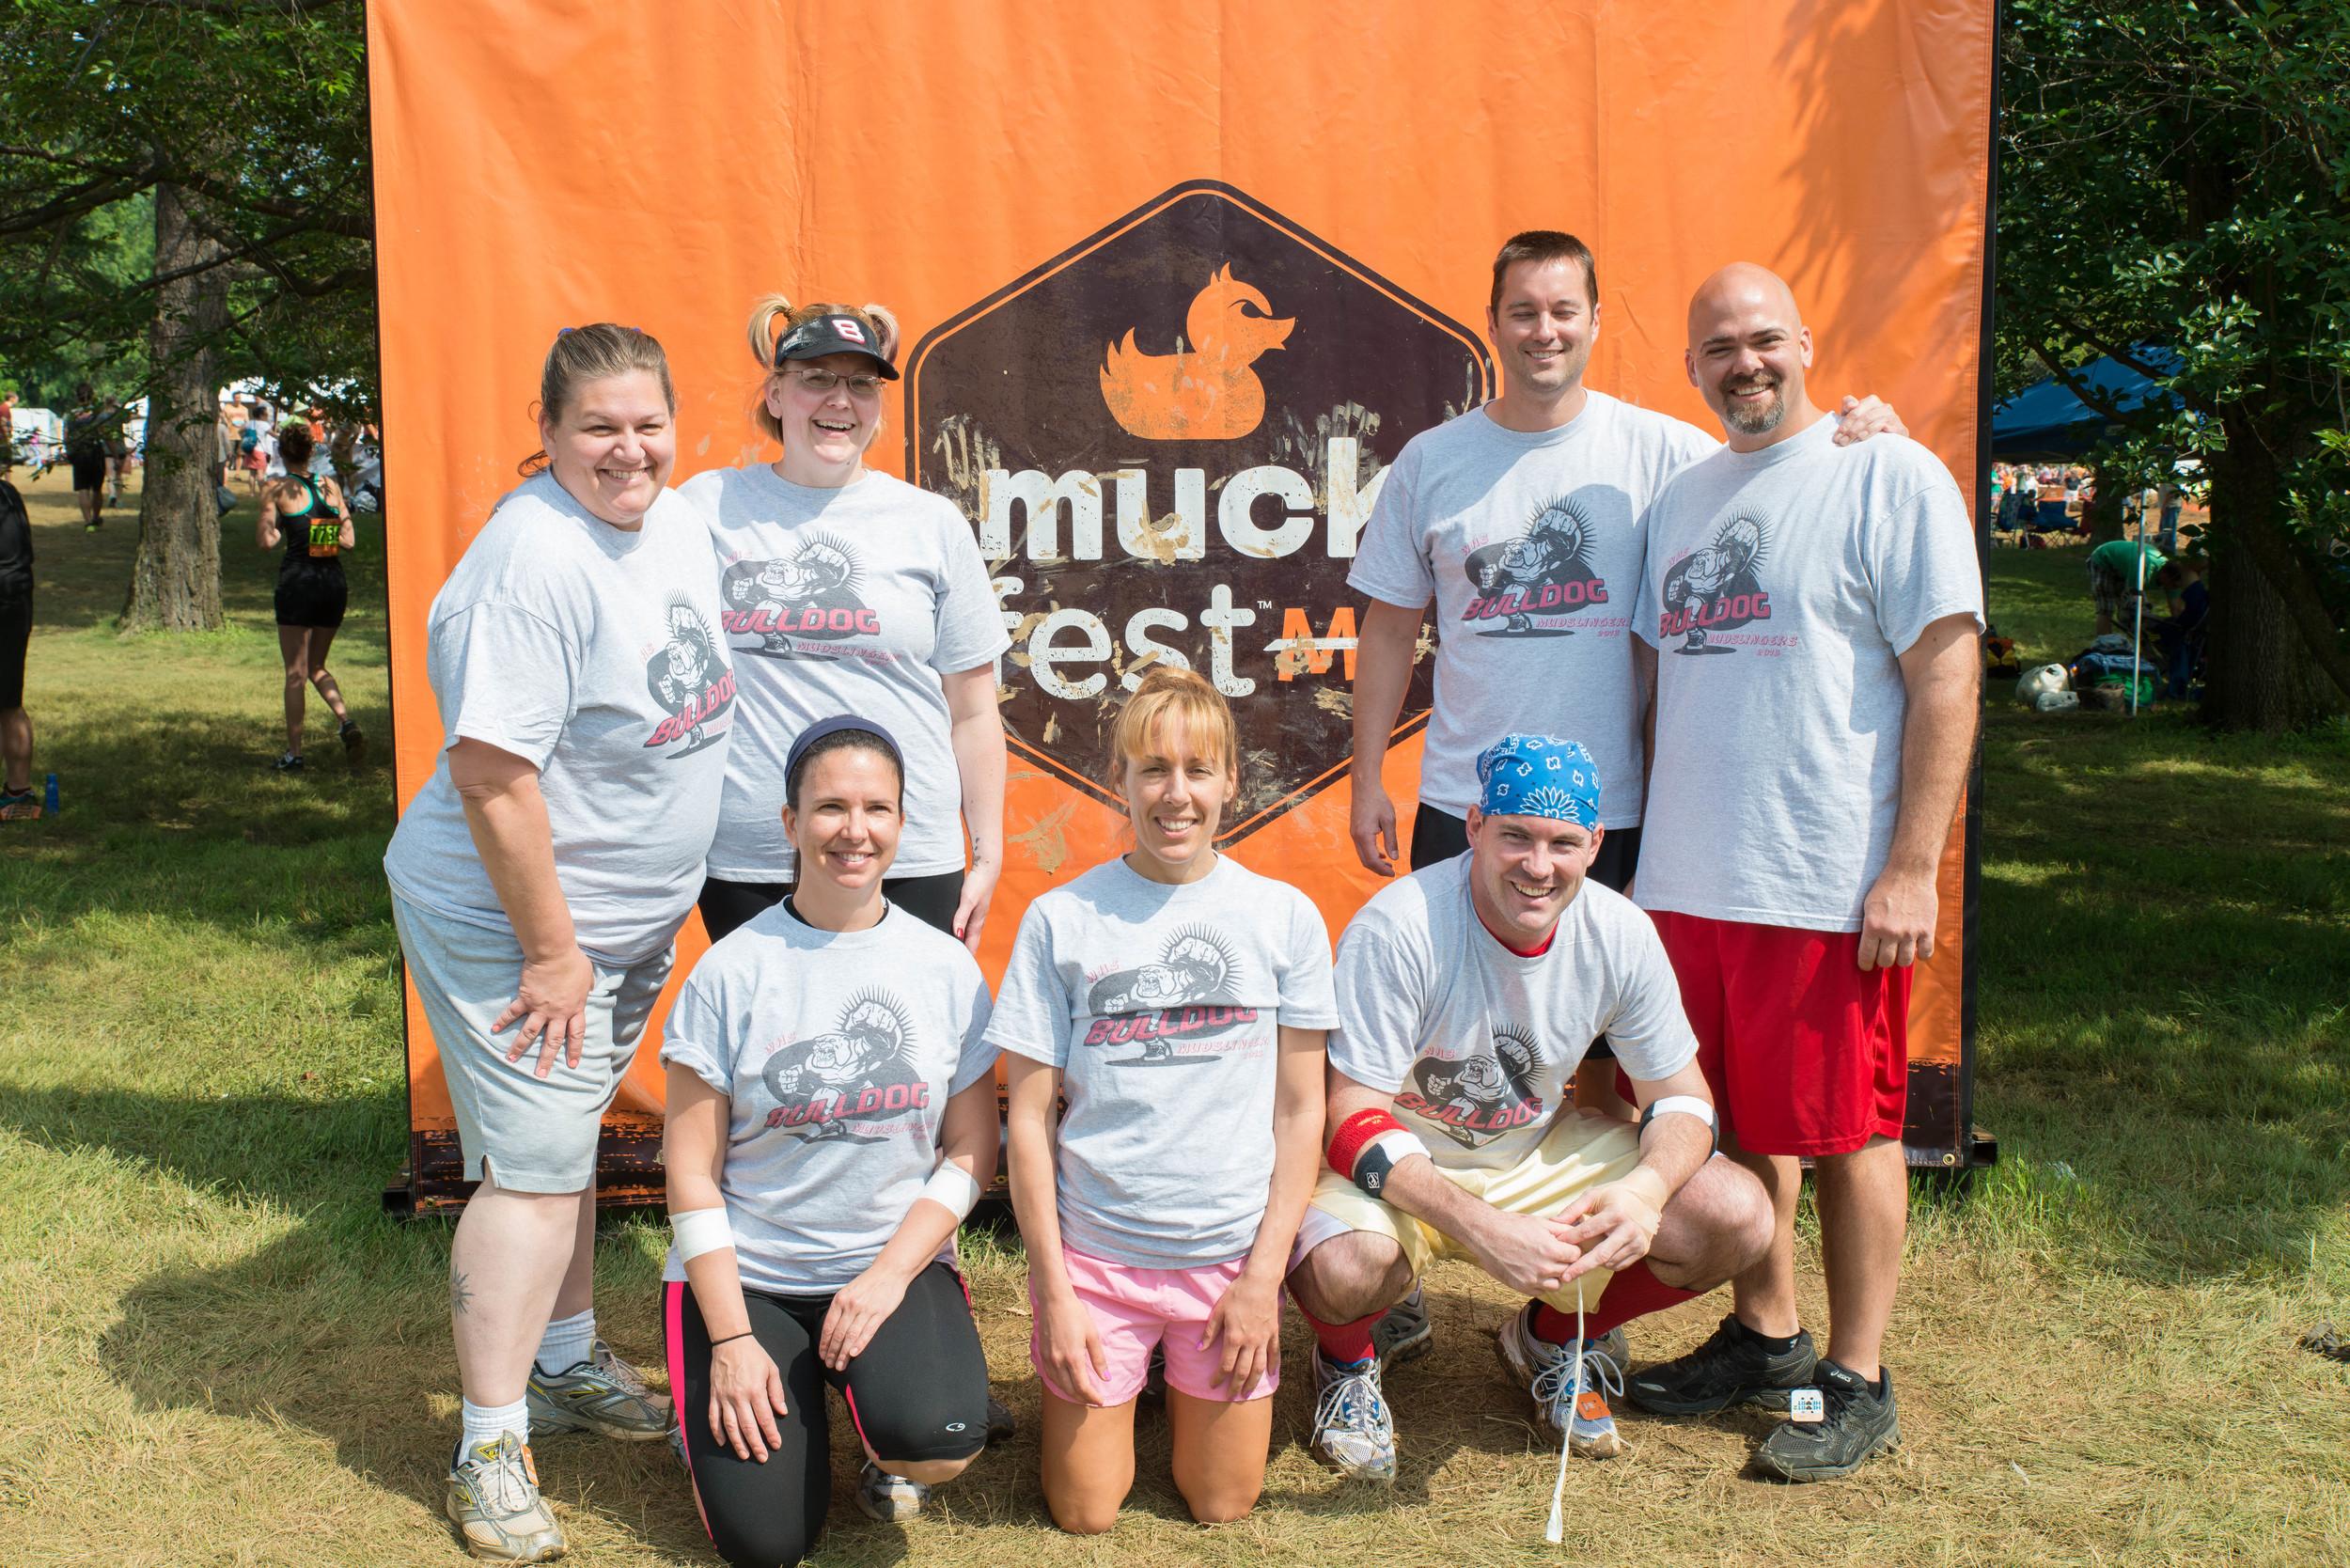 People at Muckfest (10 of 19).jpg